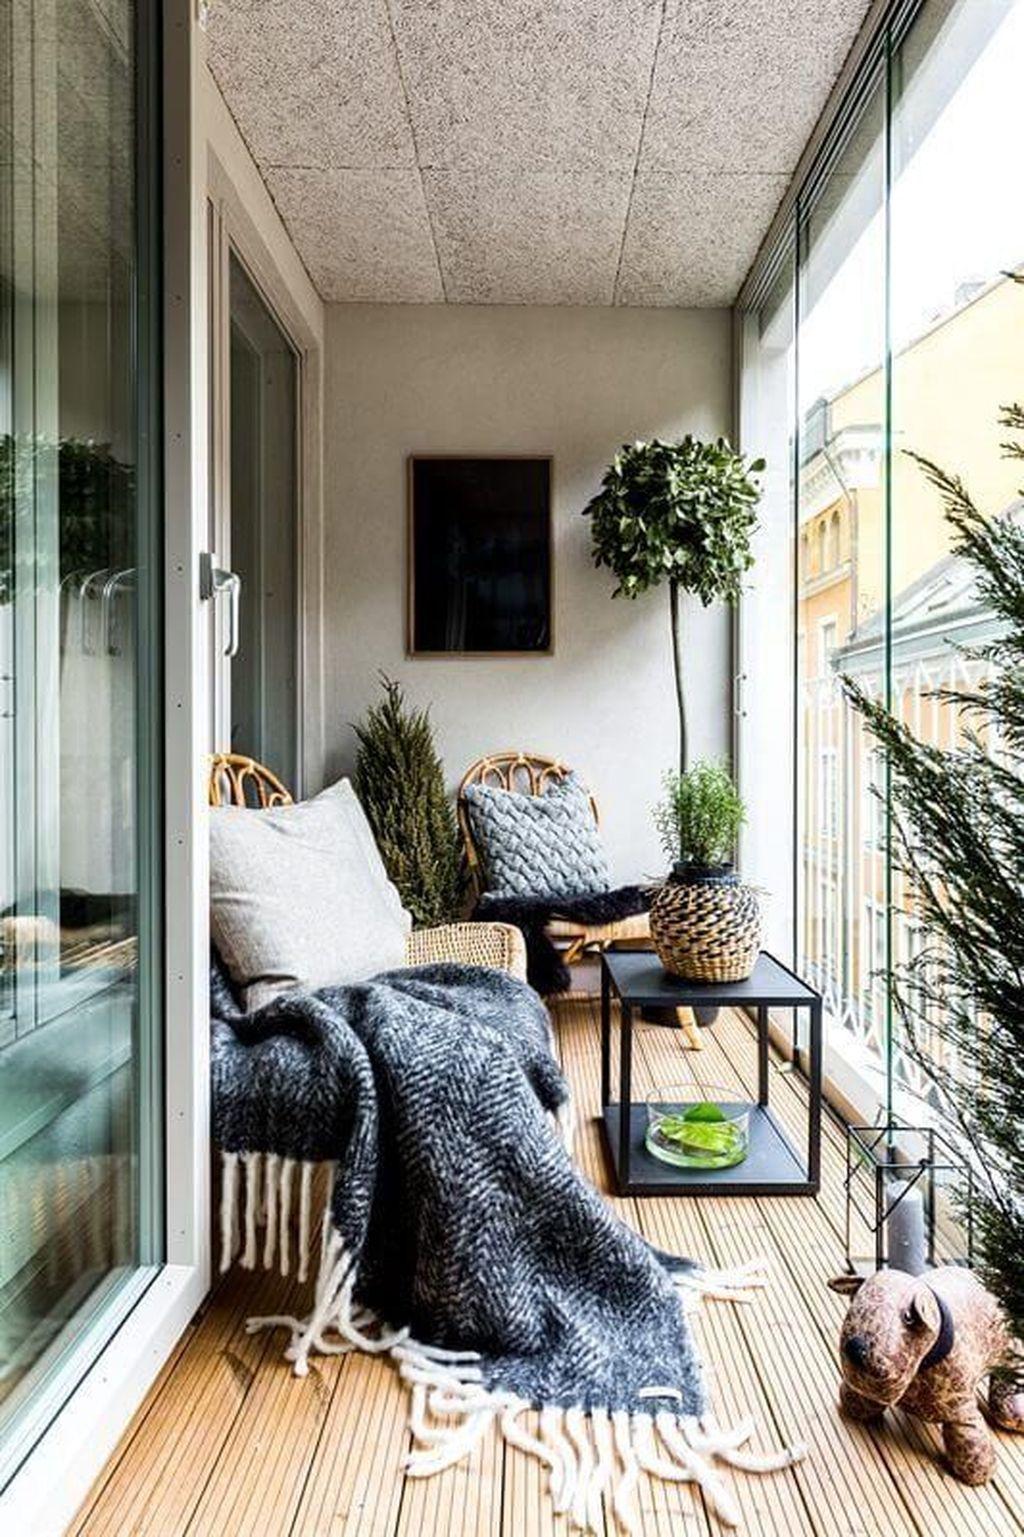 53 Unique Apartment Small Porch Decorating Ideas images